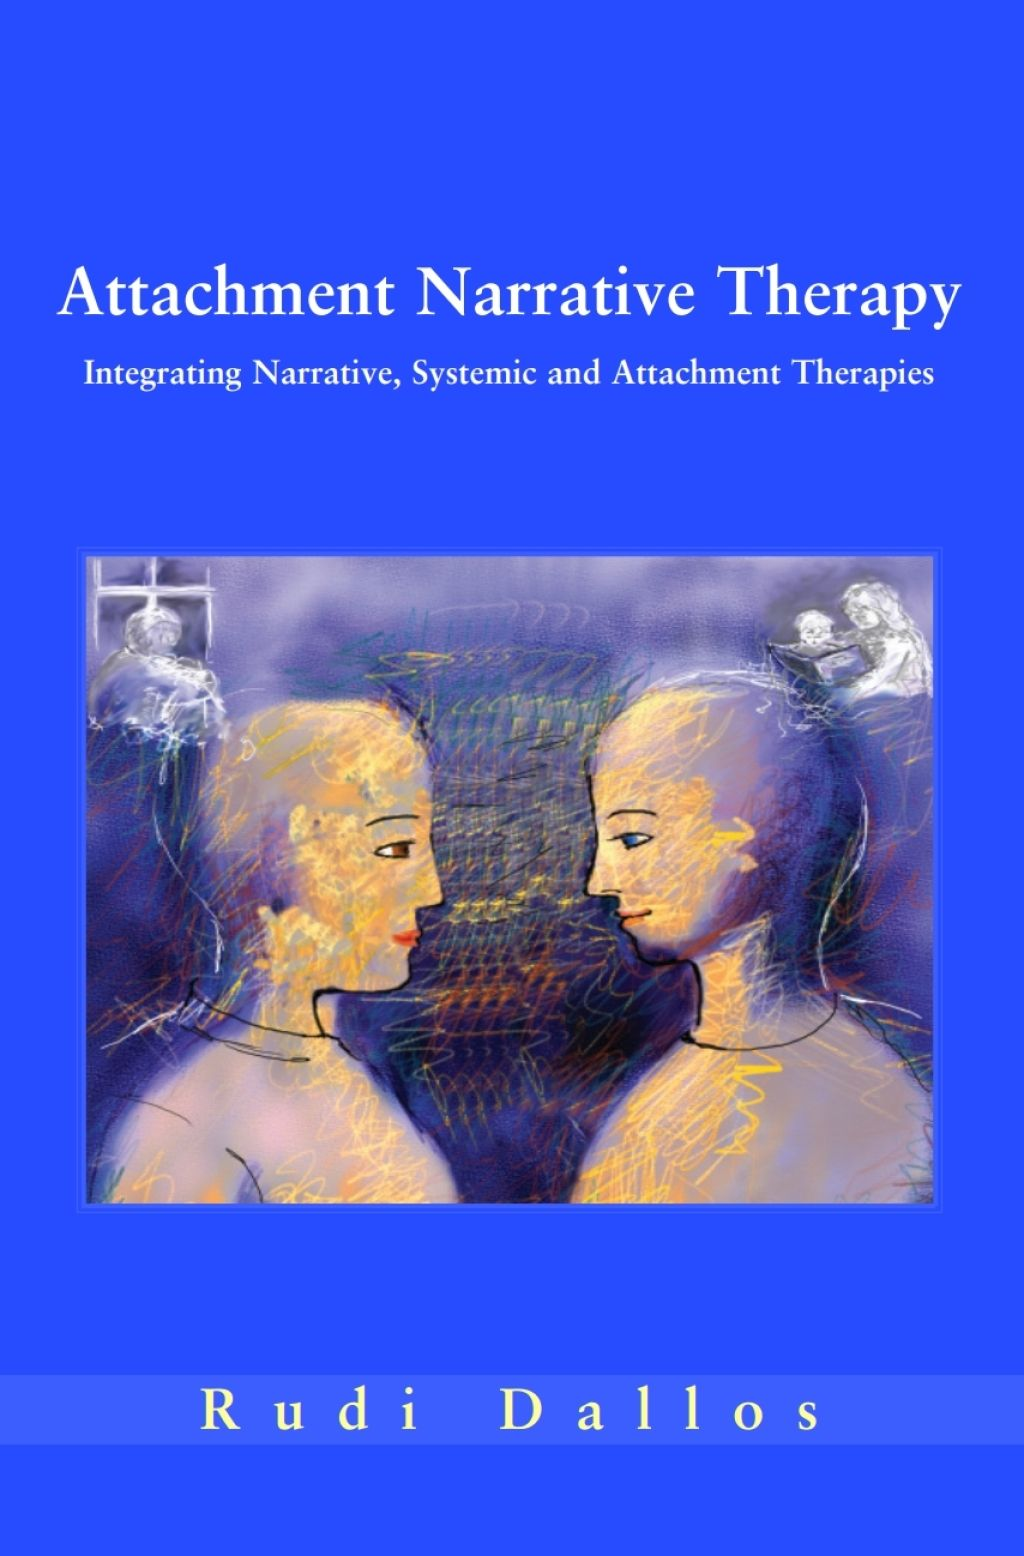 Ebook Attachment Narrative Therapy Ebook In